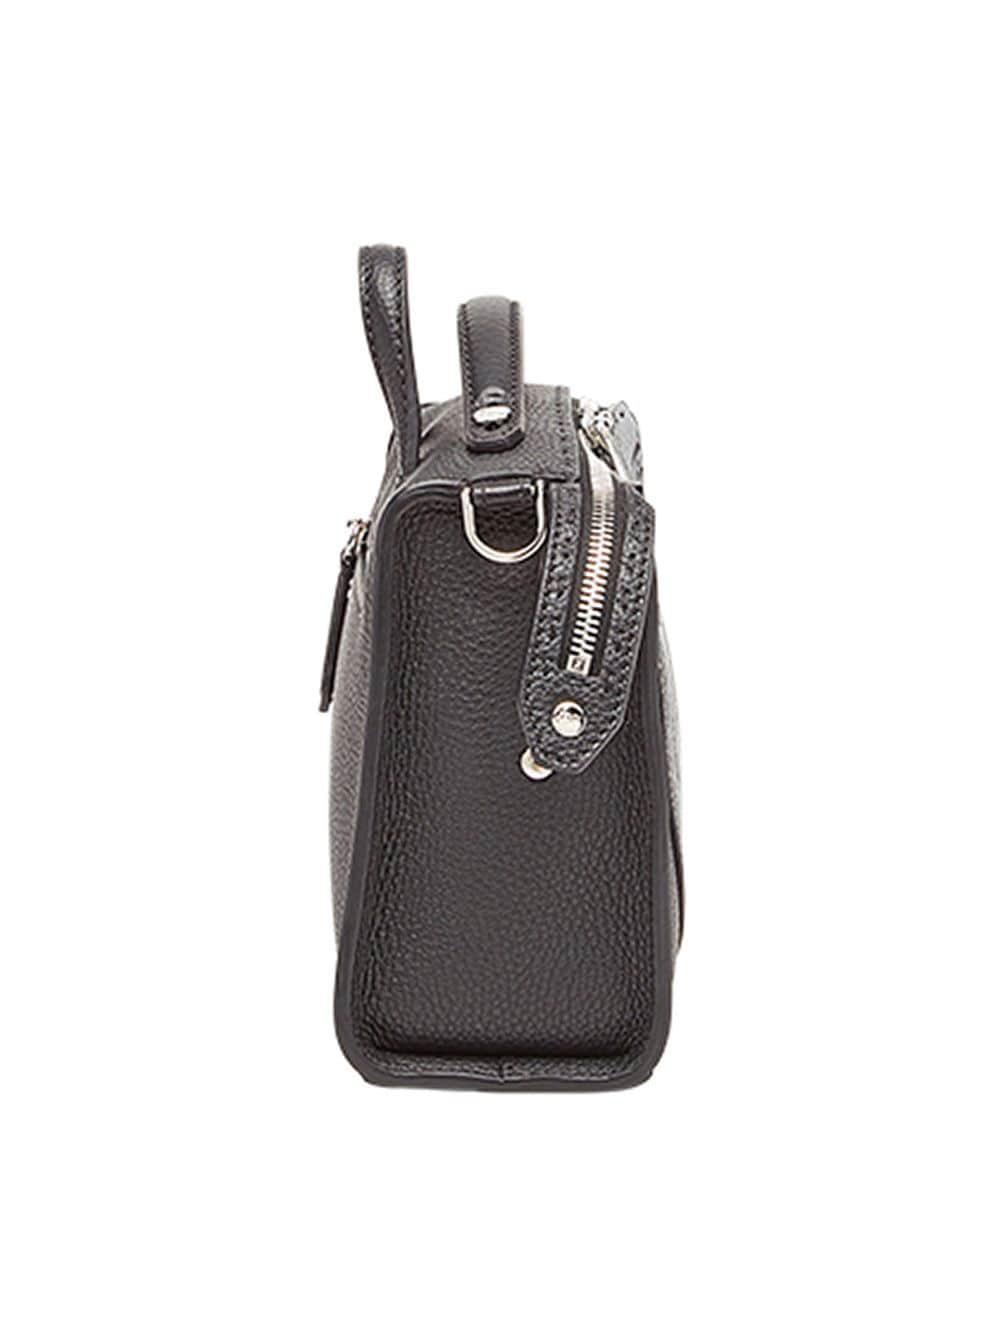 c8b2850de6a4 Lyst - Fendi Logo-stamp Lui Bag in Black for Men